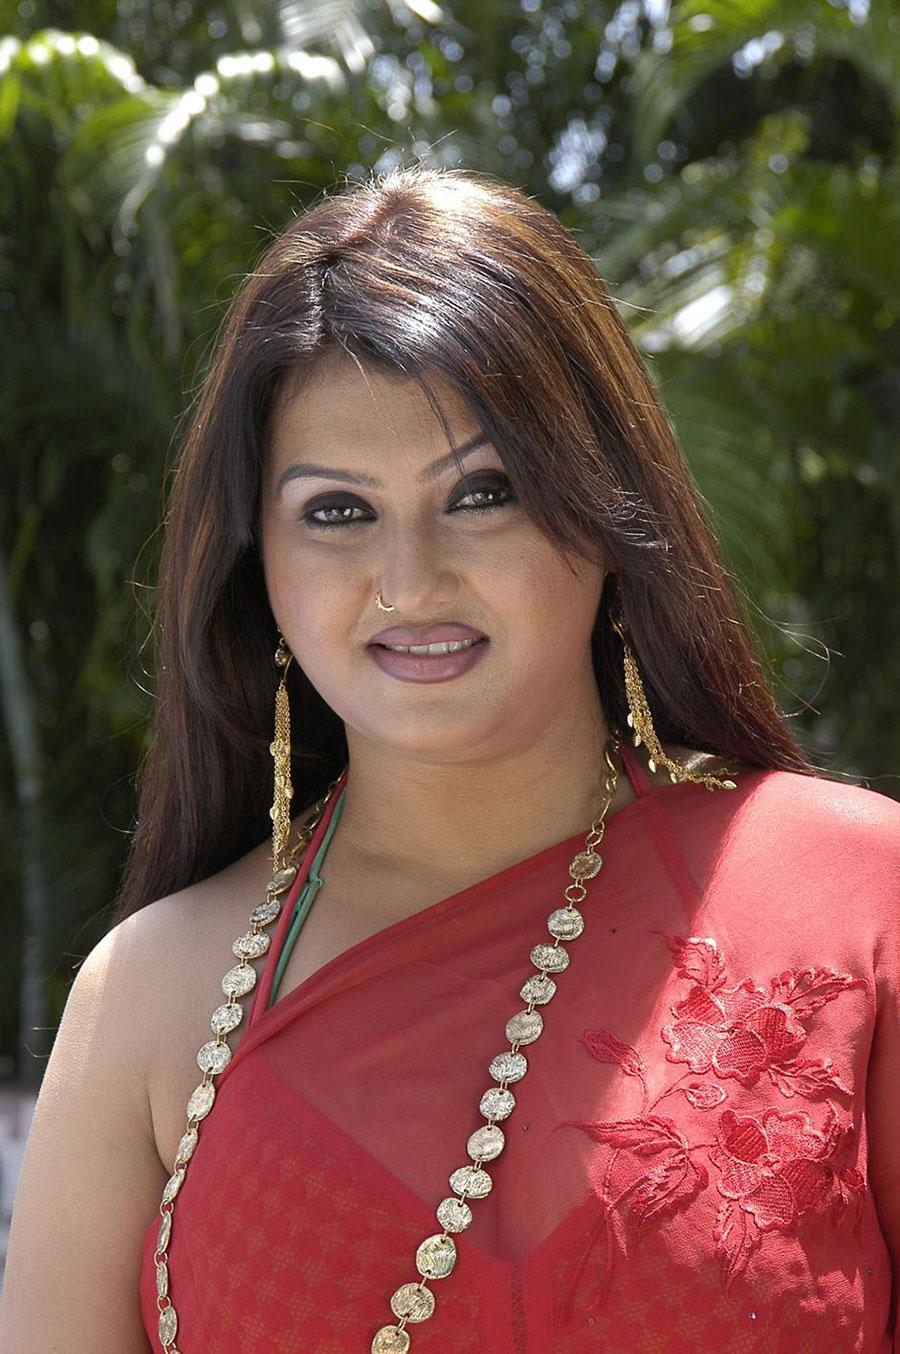 MidnightMasalaMoviescom Indian sex movies Mallu Masala